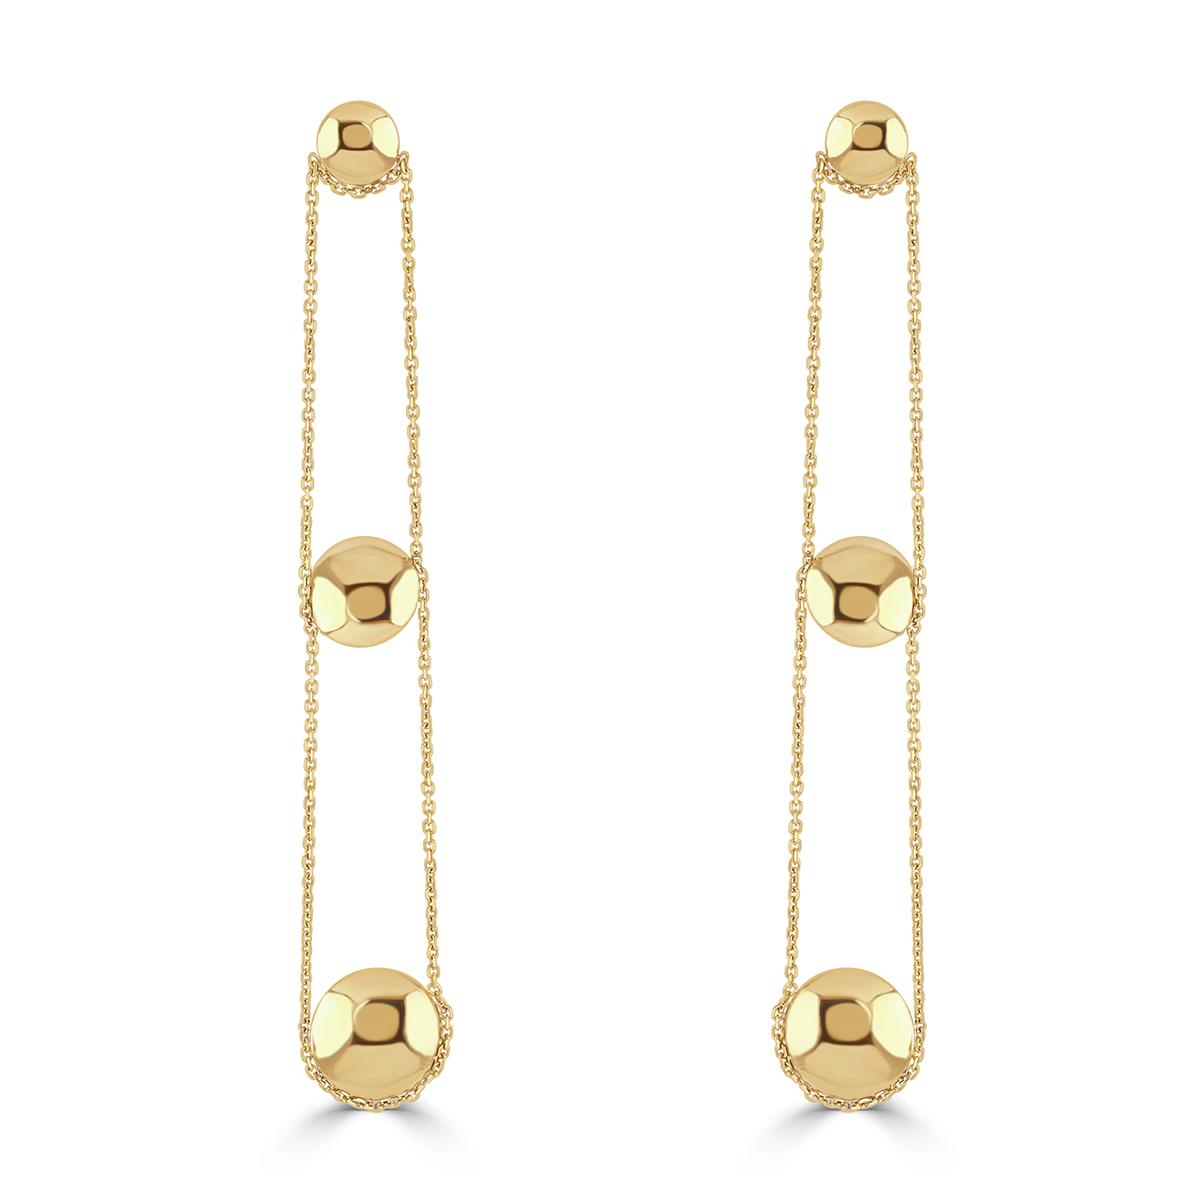 Giallo Sphere Yellow Gold Drop Earrings